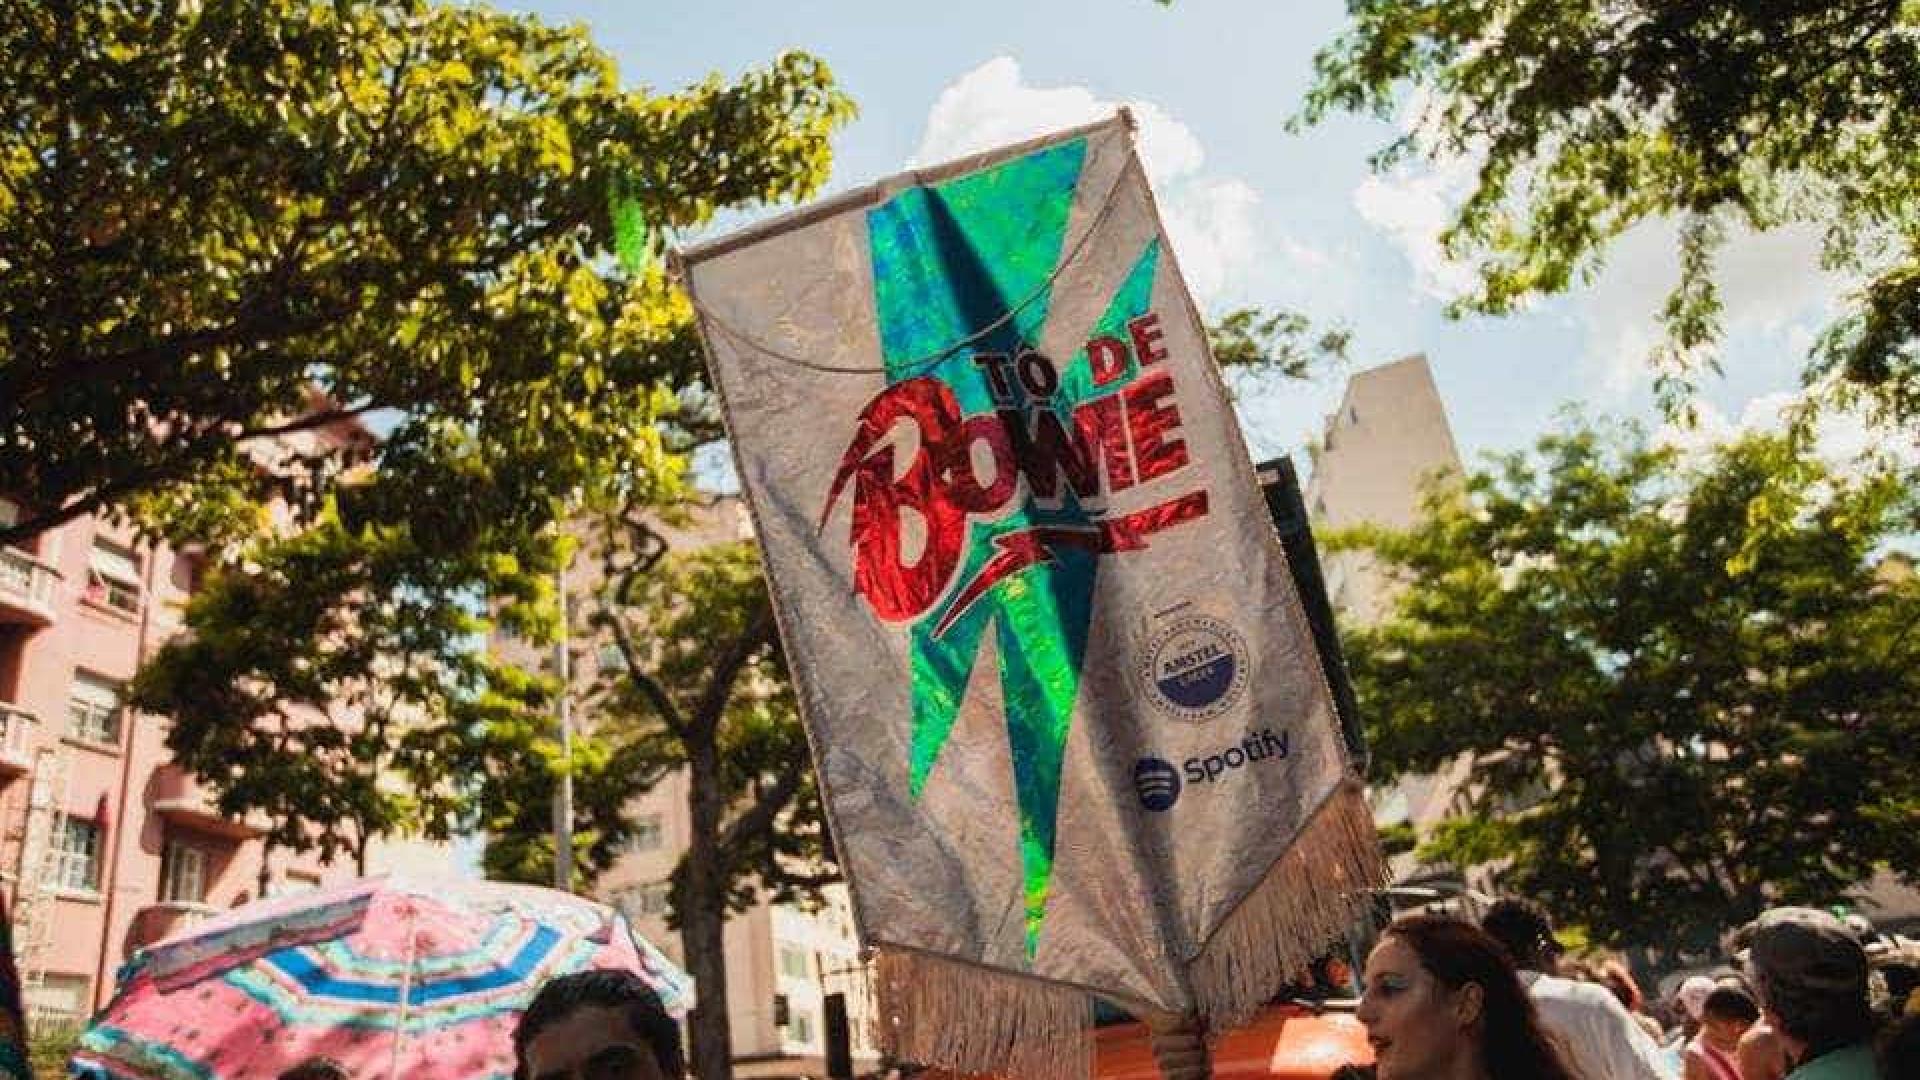 Bloco de rua tradicional homenageia David Bowie na capital paulista